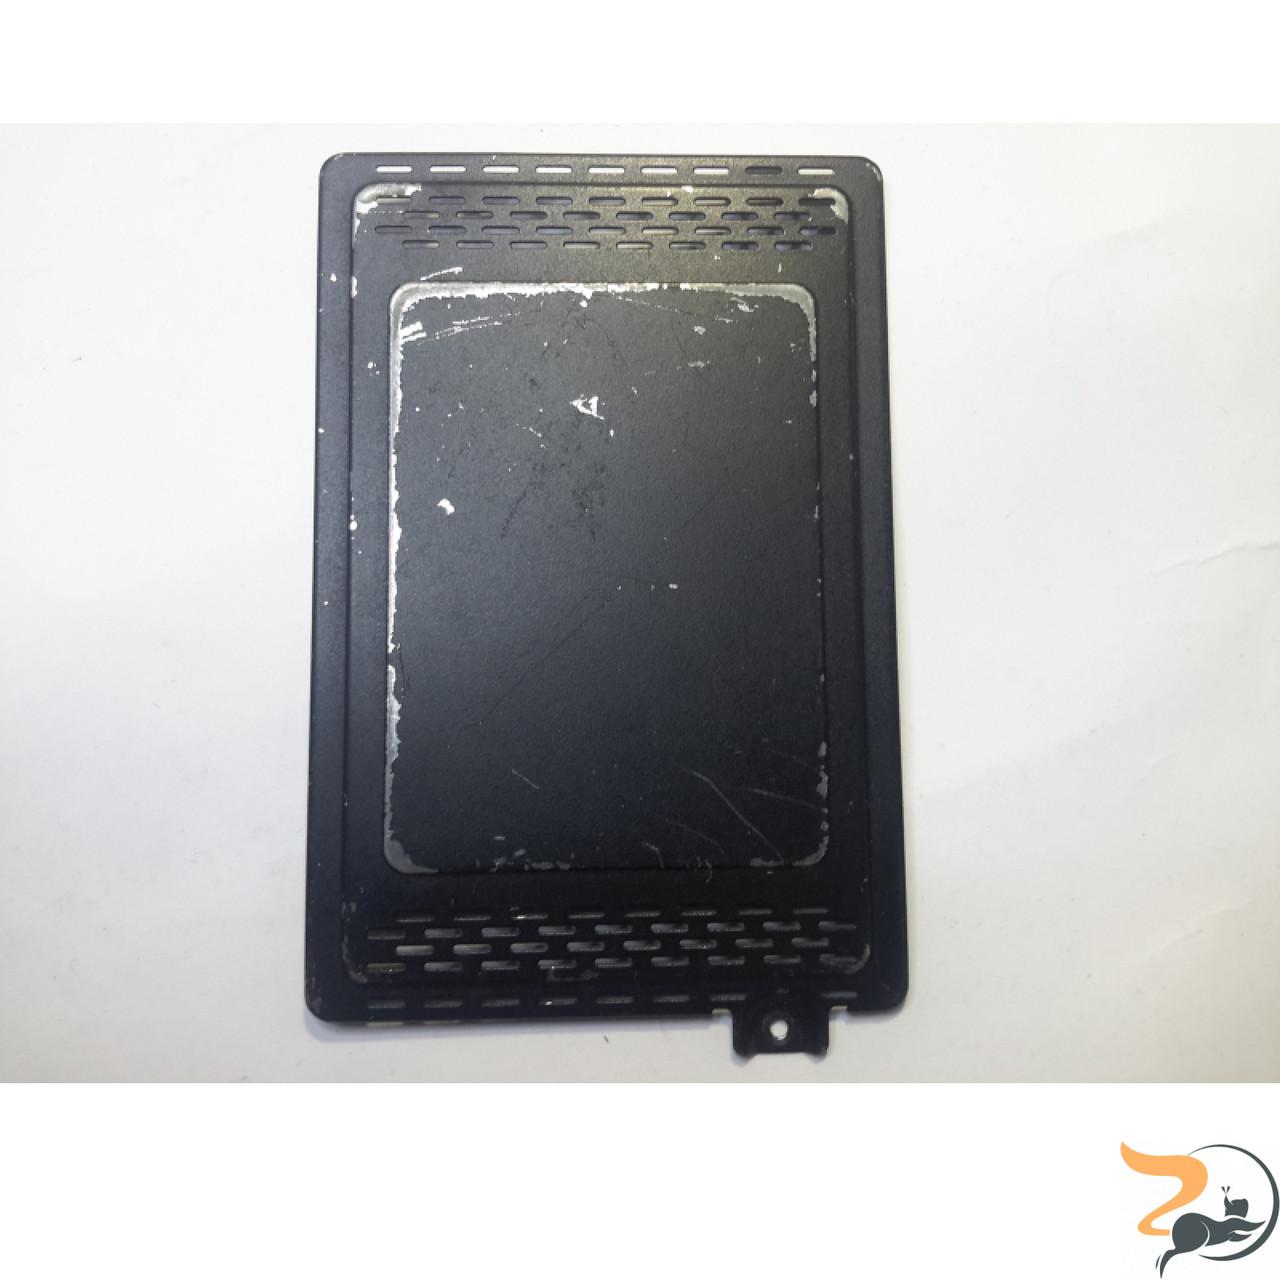 Сервісна кришка для ноутбука Asus A6M,A6, 13GNDK1AM0220-1, Б/В